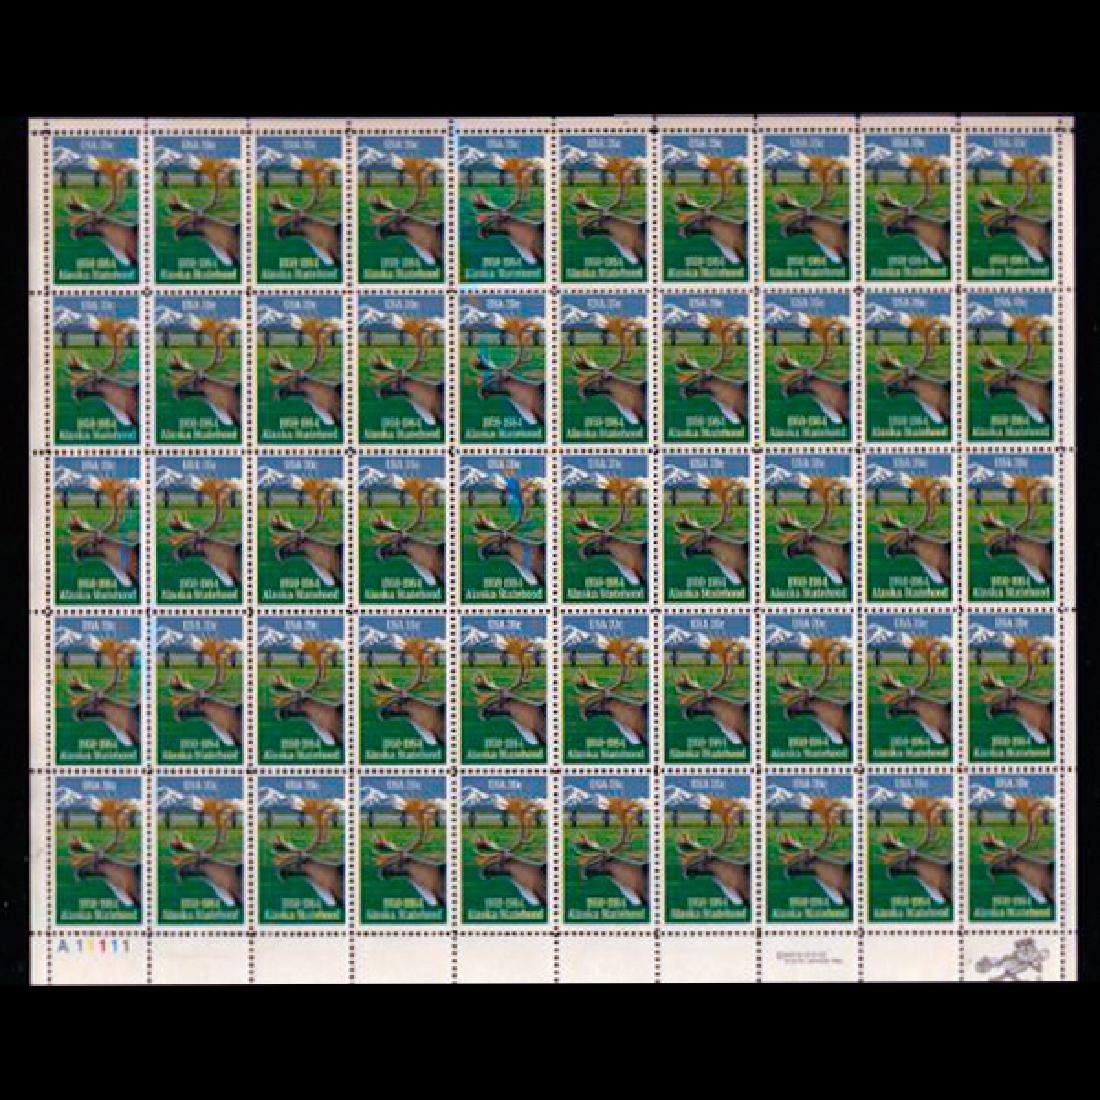 1984 US Sheet 20c Alaska Statehood Stamps MNH Scarce